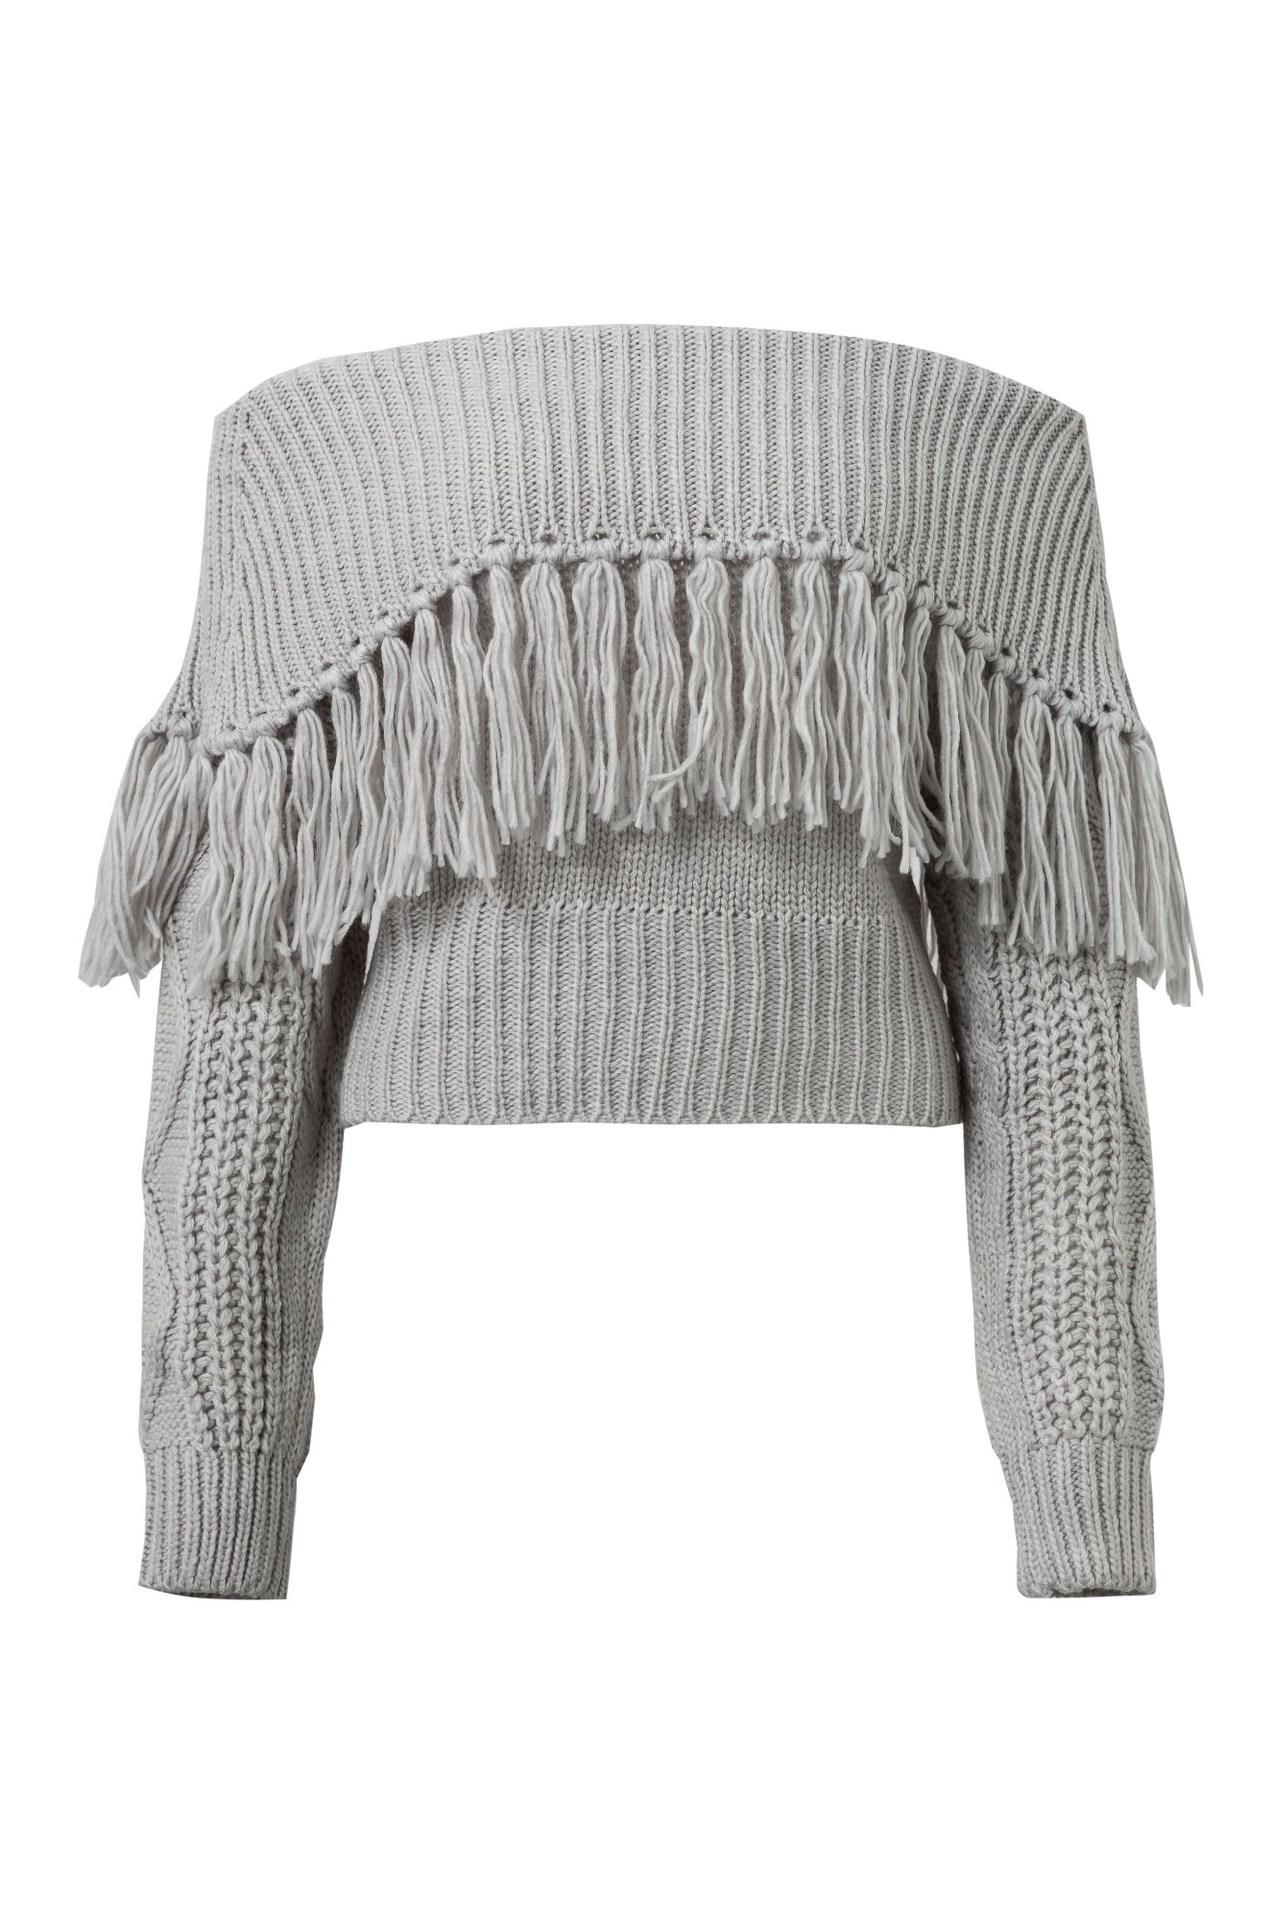 one-shoulder tassel strapless sexy sweater NSYD3673